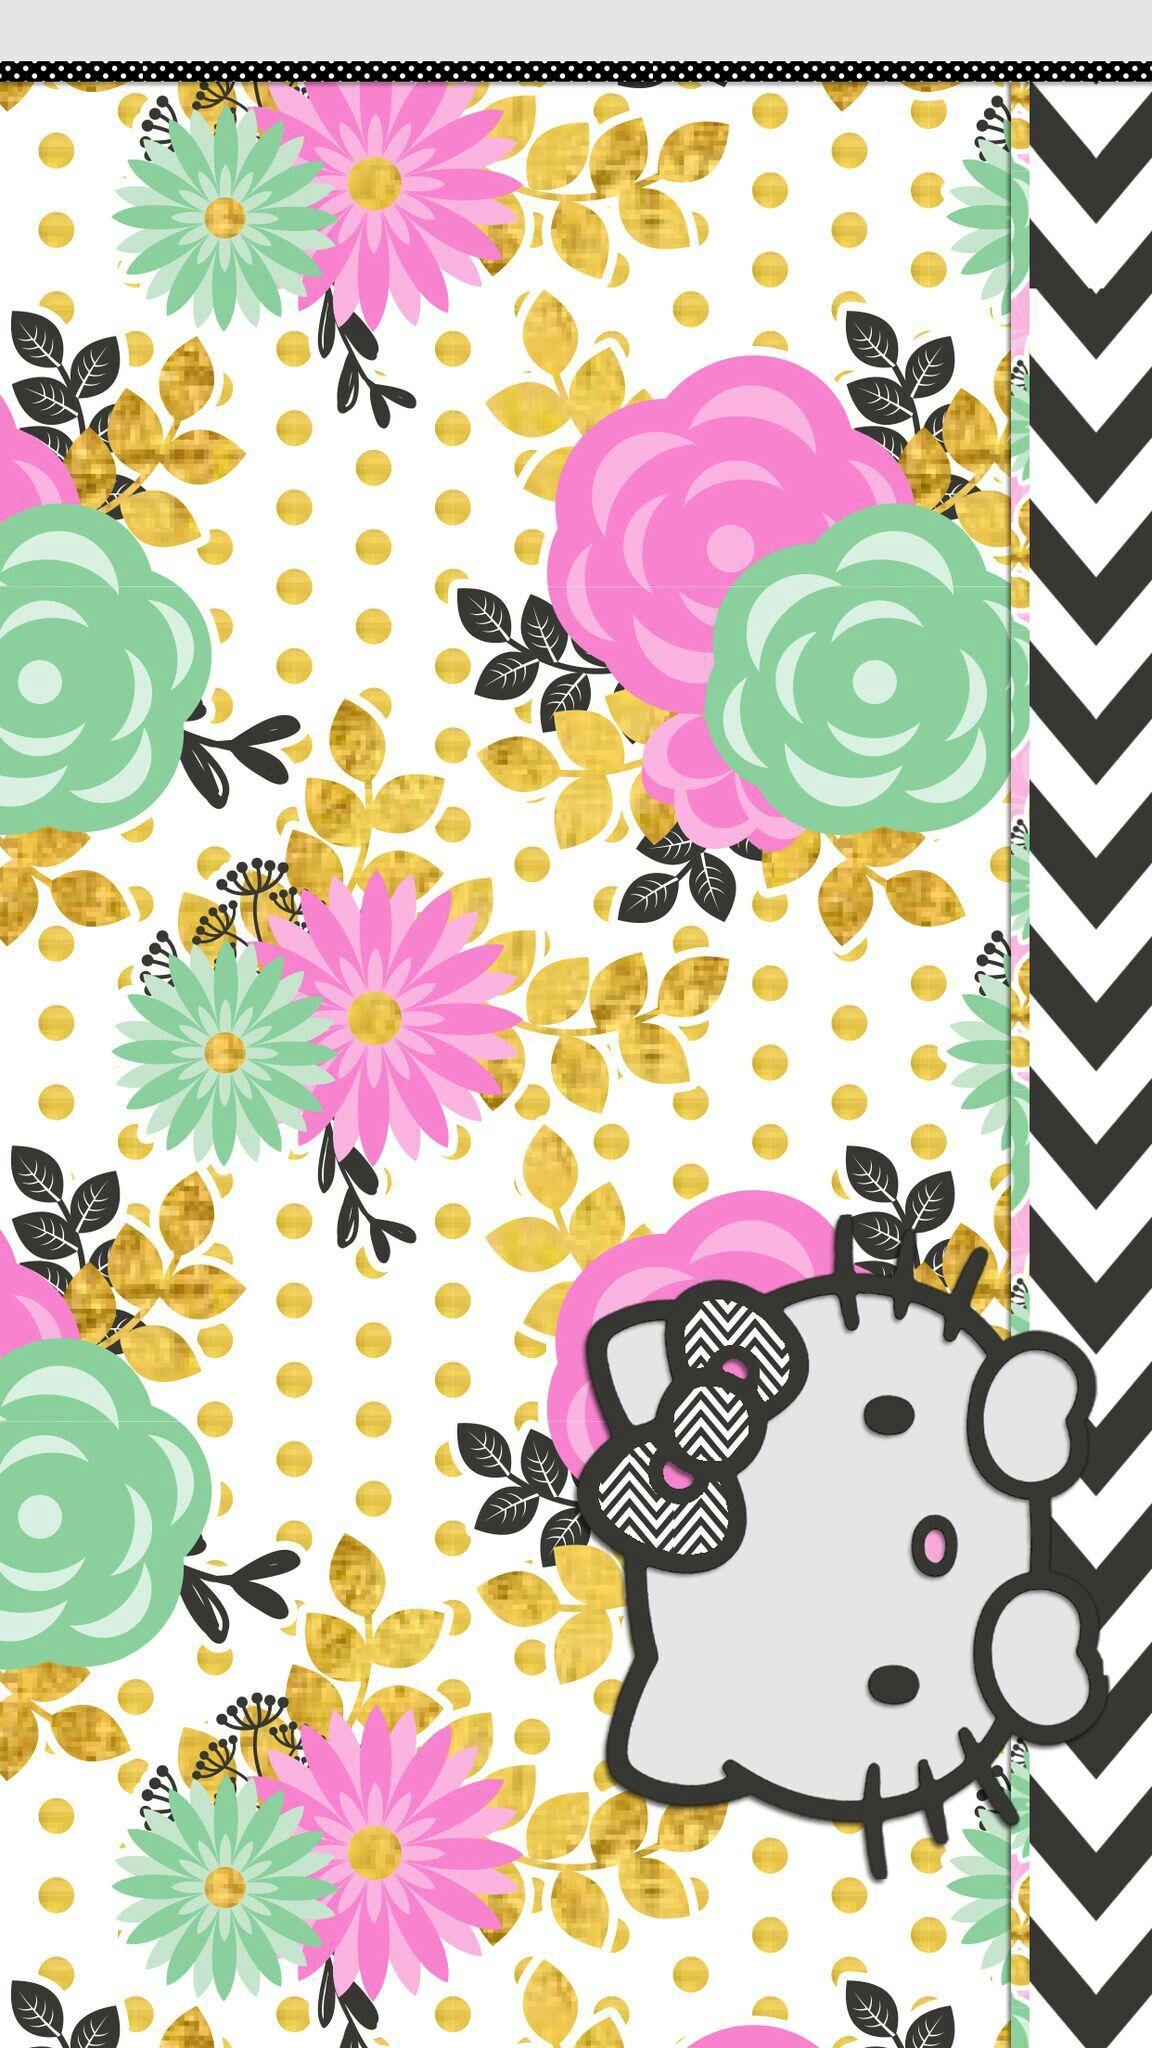 Iphone Wall Hk Tjn Iphone Walls 3 Pinterest Hello Kitty